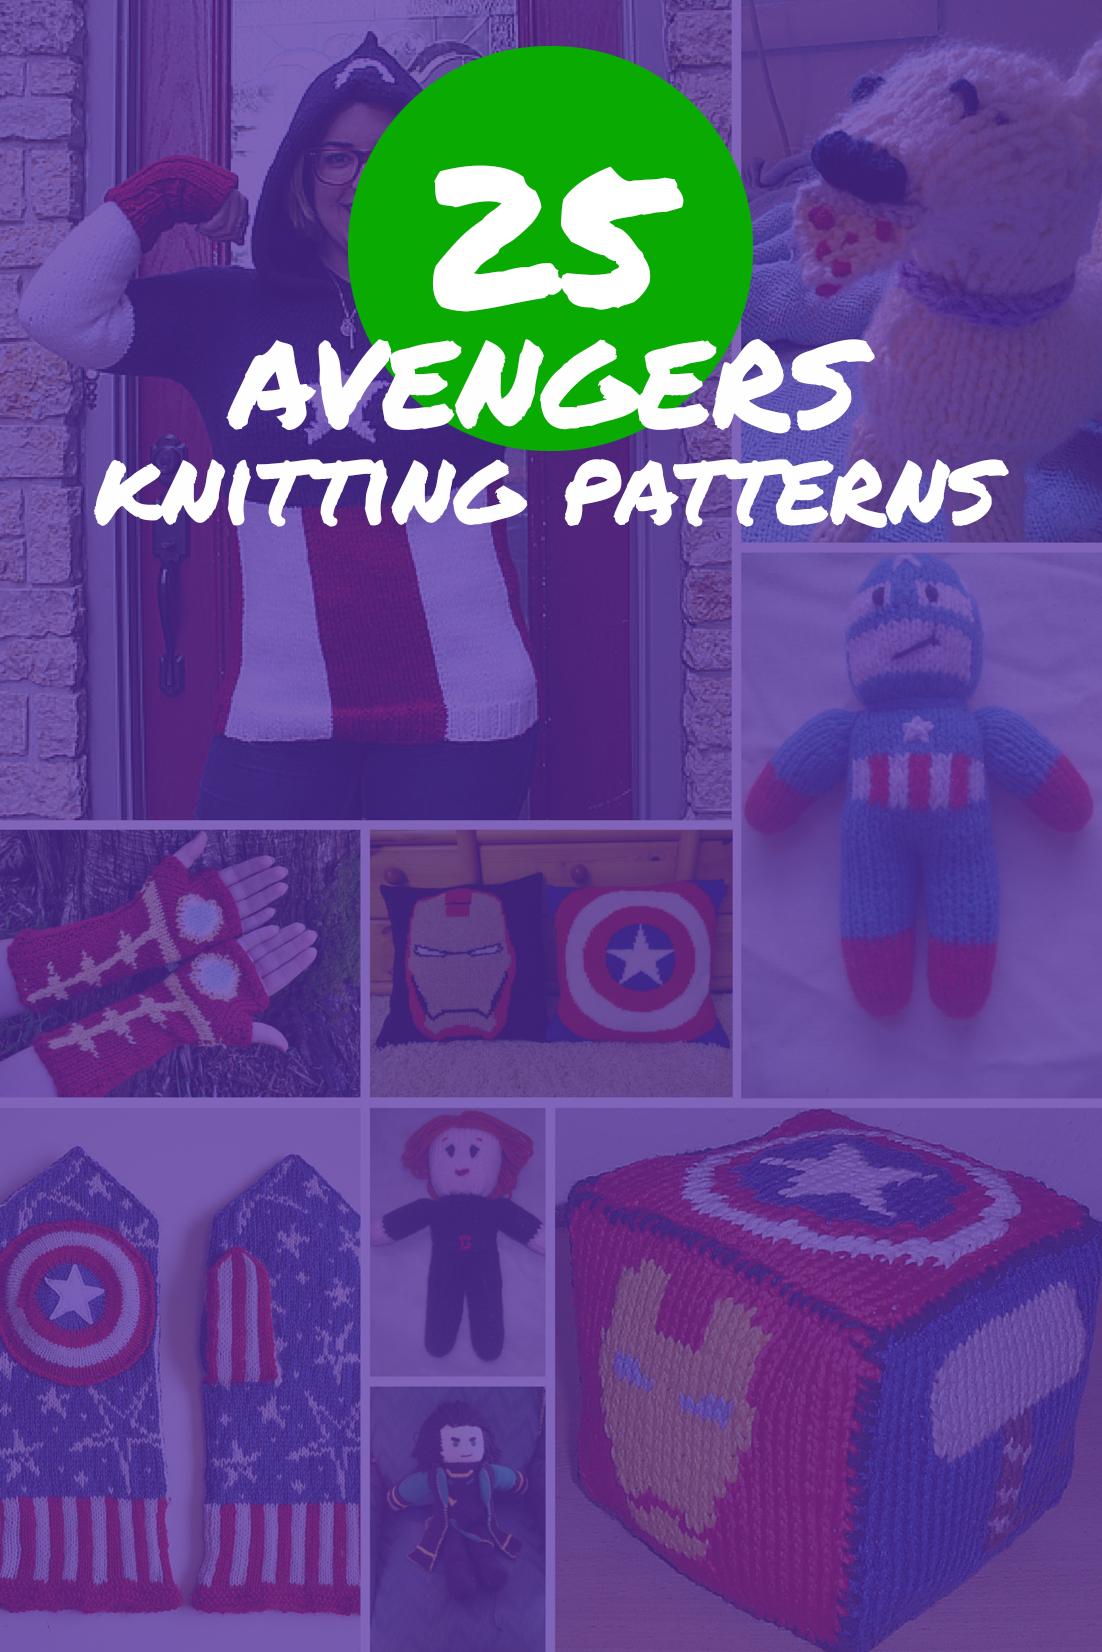 25 Avengers Knitting Patterns   see all at knittingfornerds.com ...